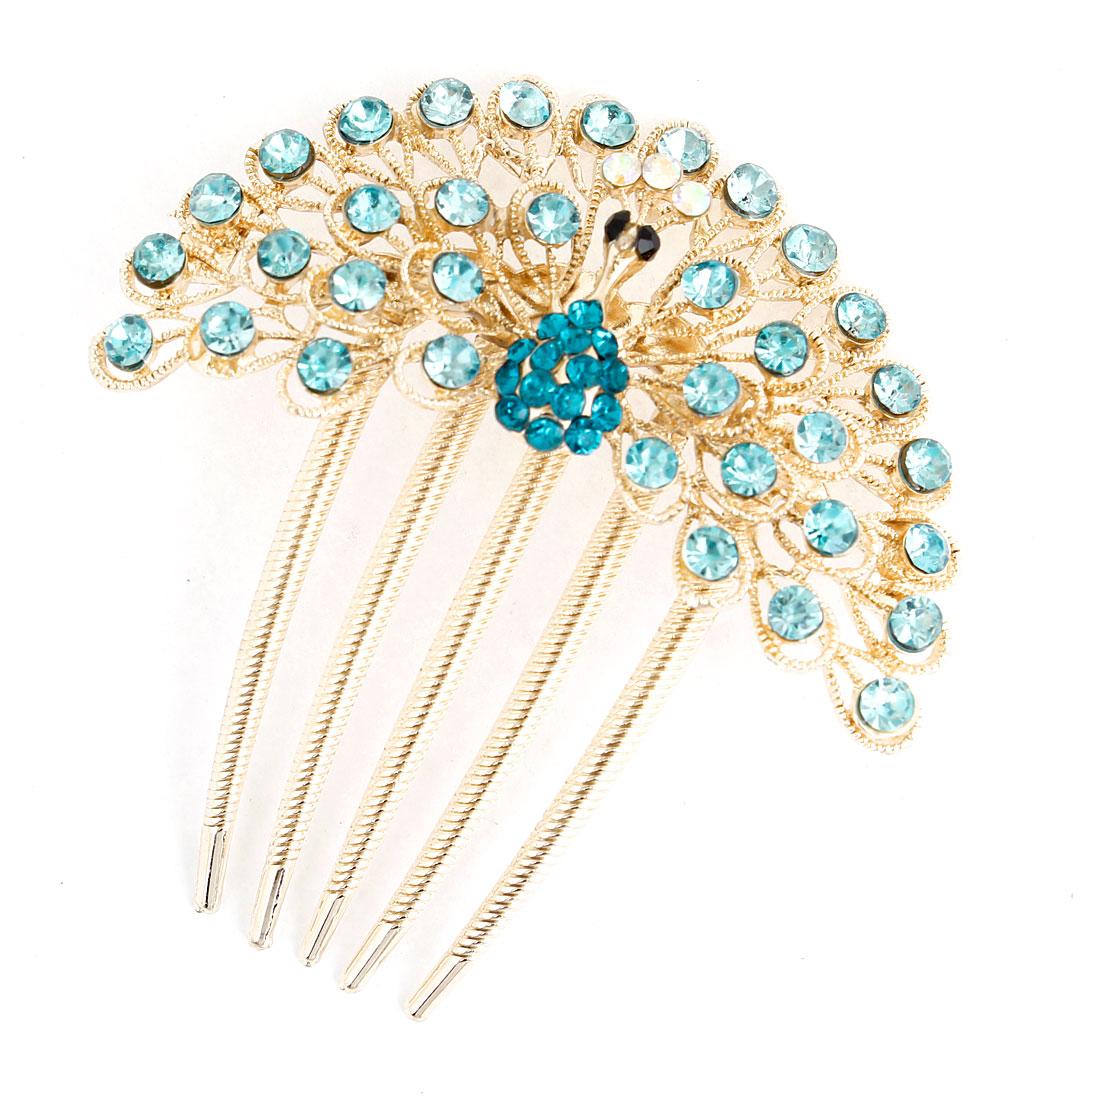 Lady Turquoise Glittery Plastic Rhinestone Decoration Comb Hairpin Gold Tone